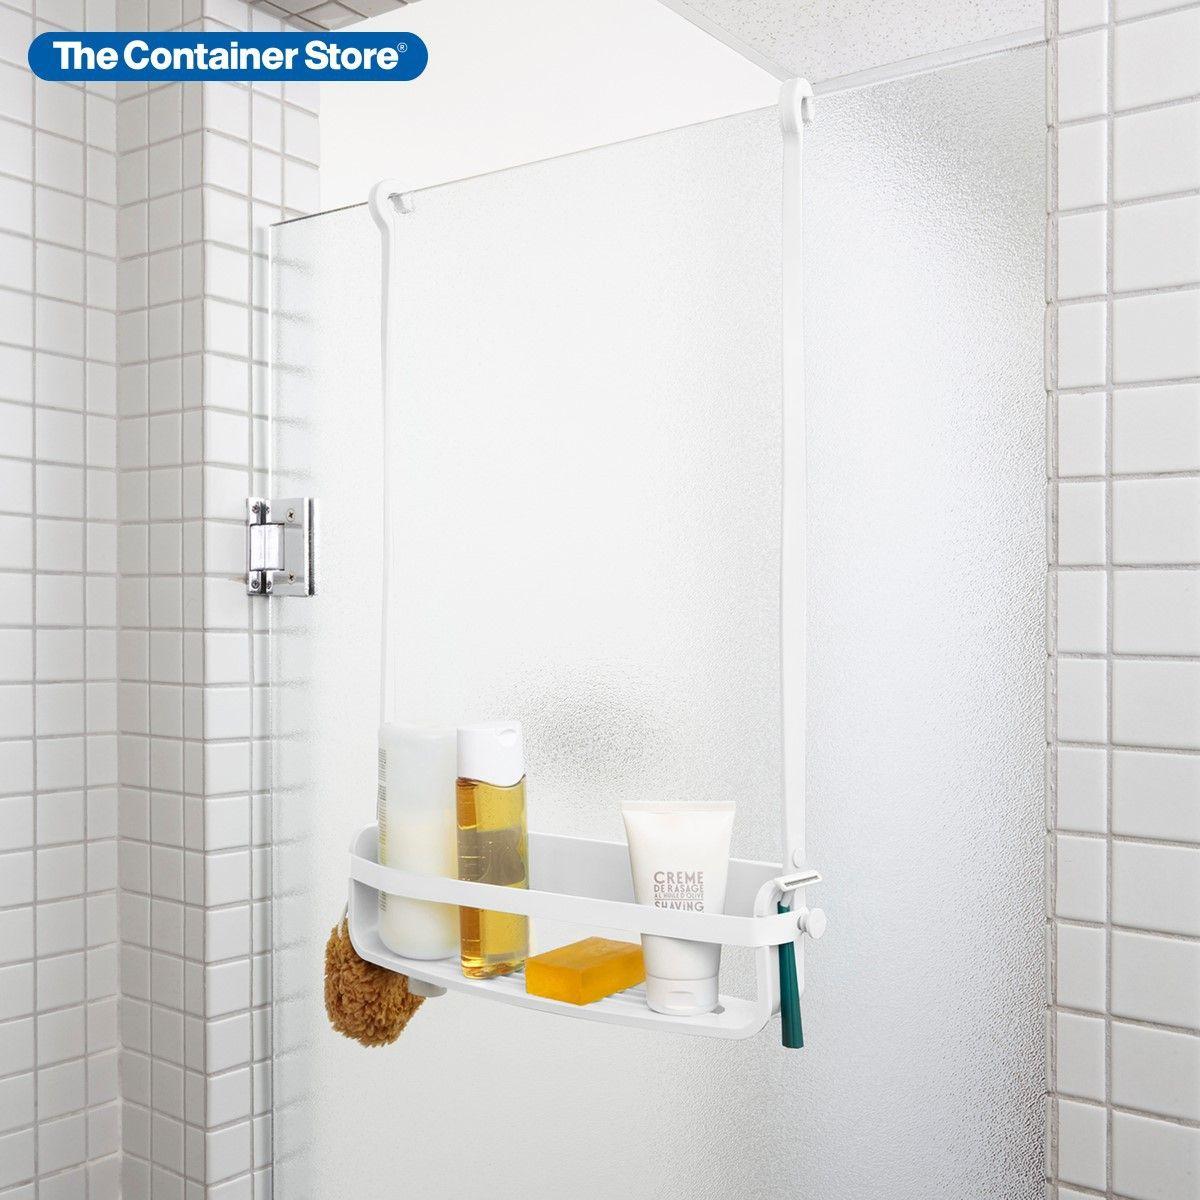 Umbra Flex Single Shelf Caddy Shower Caddy Plastic Shelves Hanging Shower Caddy